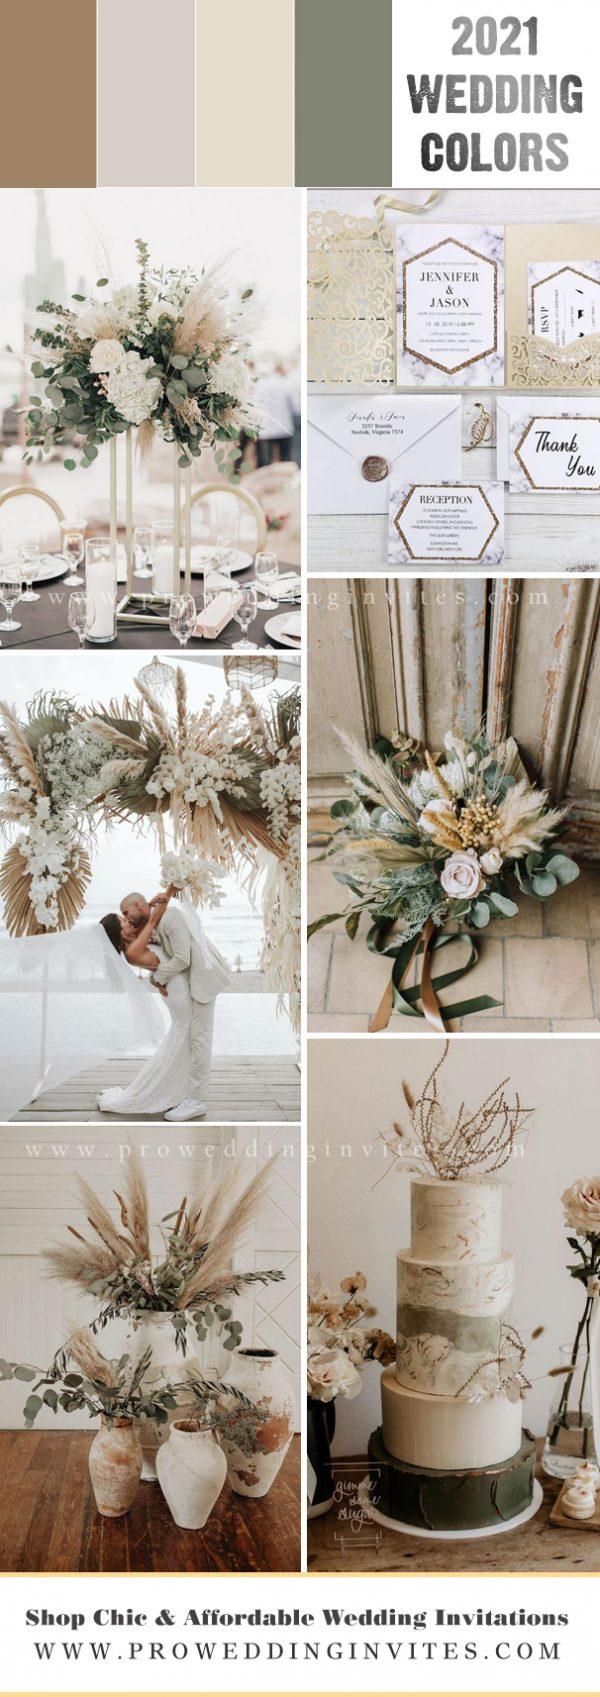 Neutral Earth Tone Bohemian Elopement Wedding